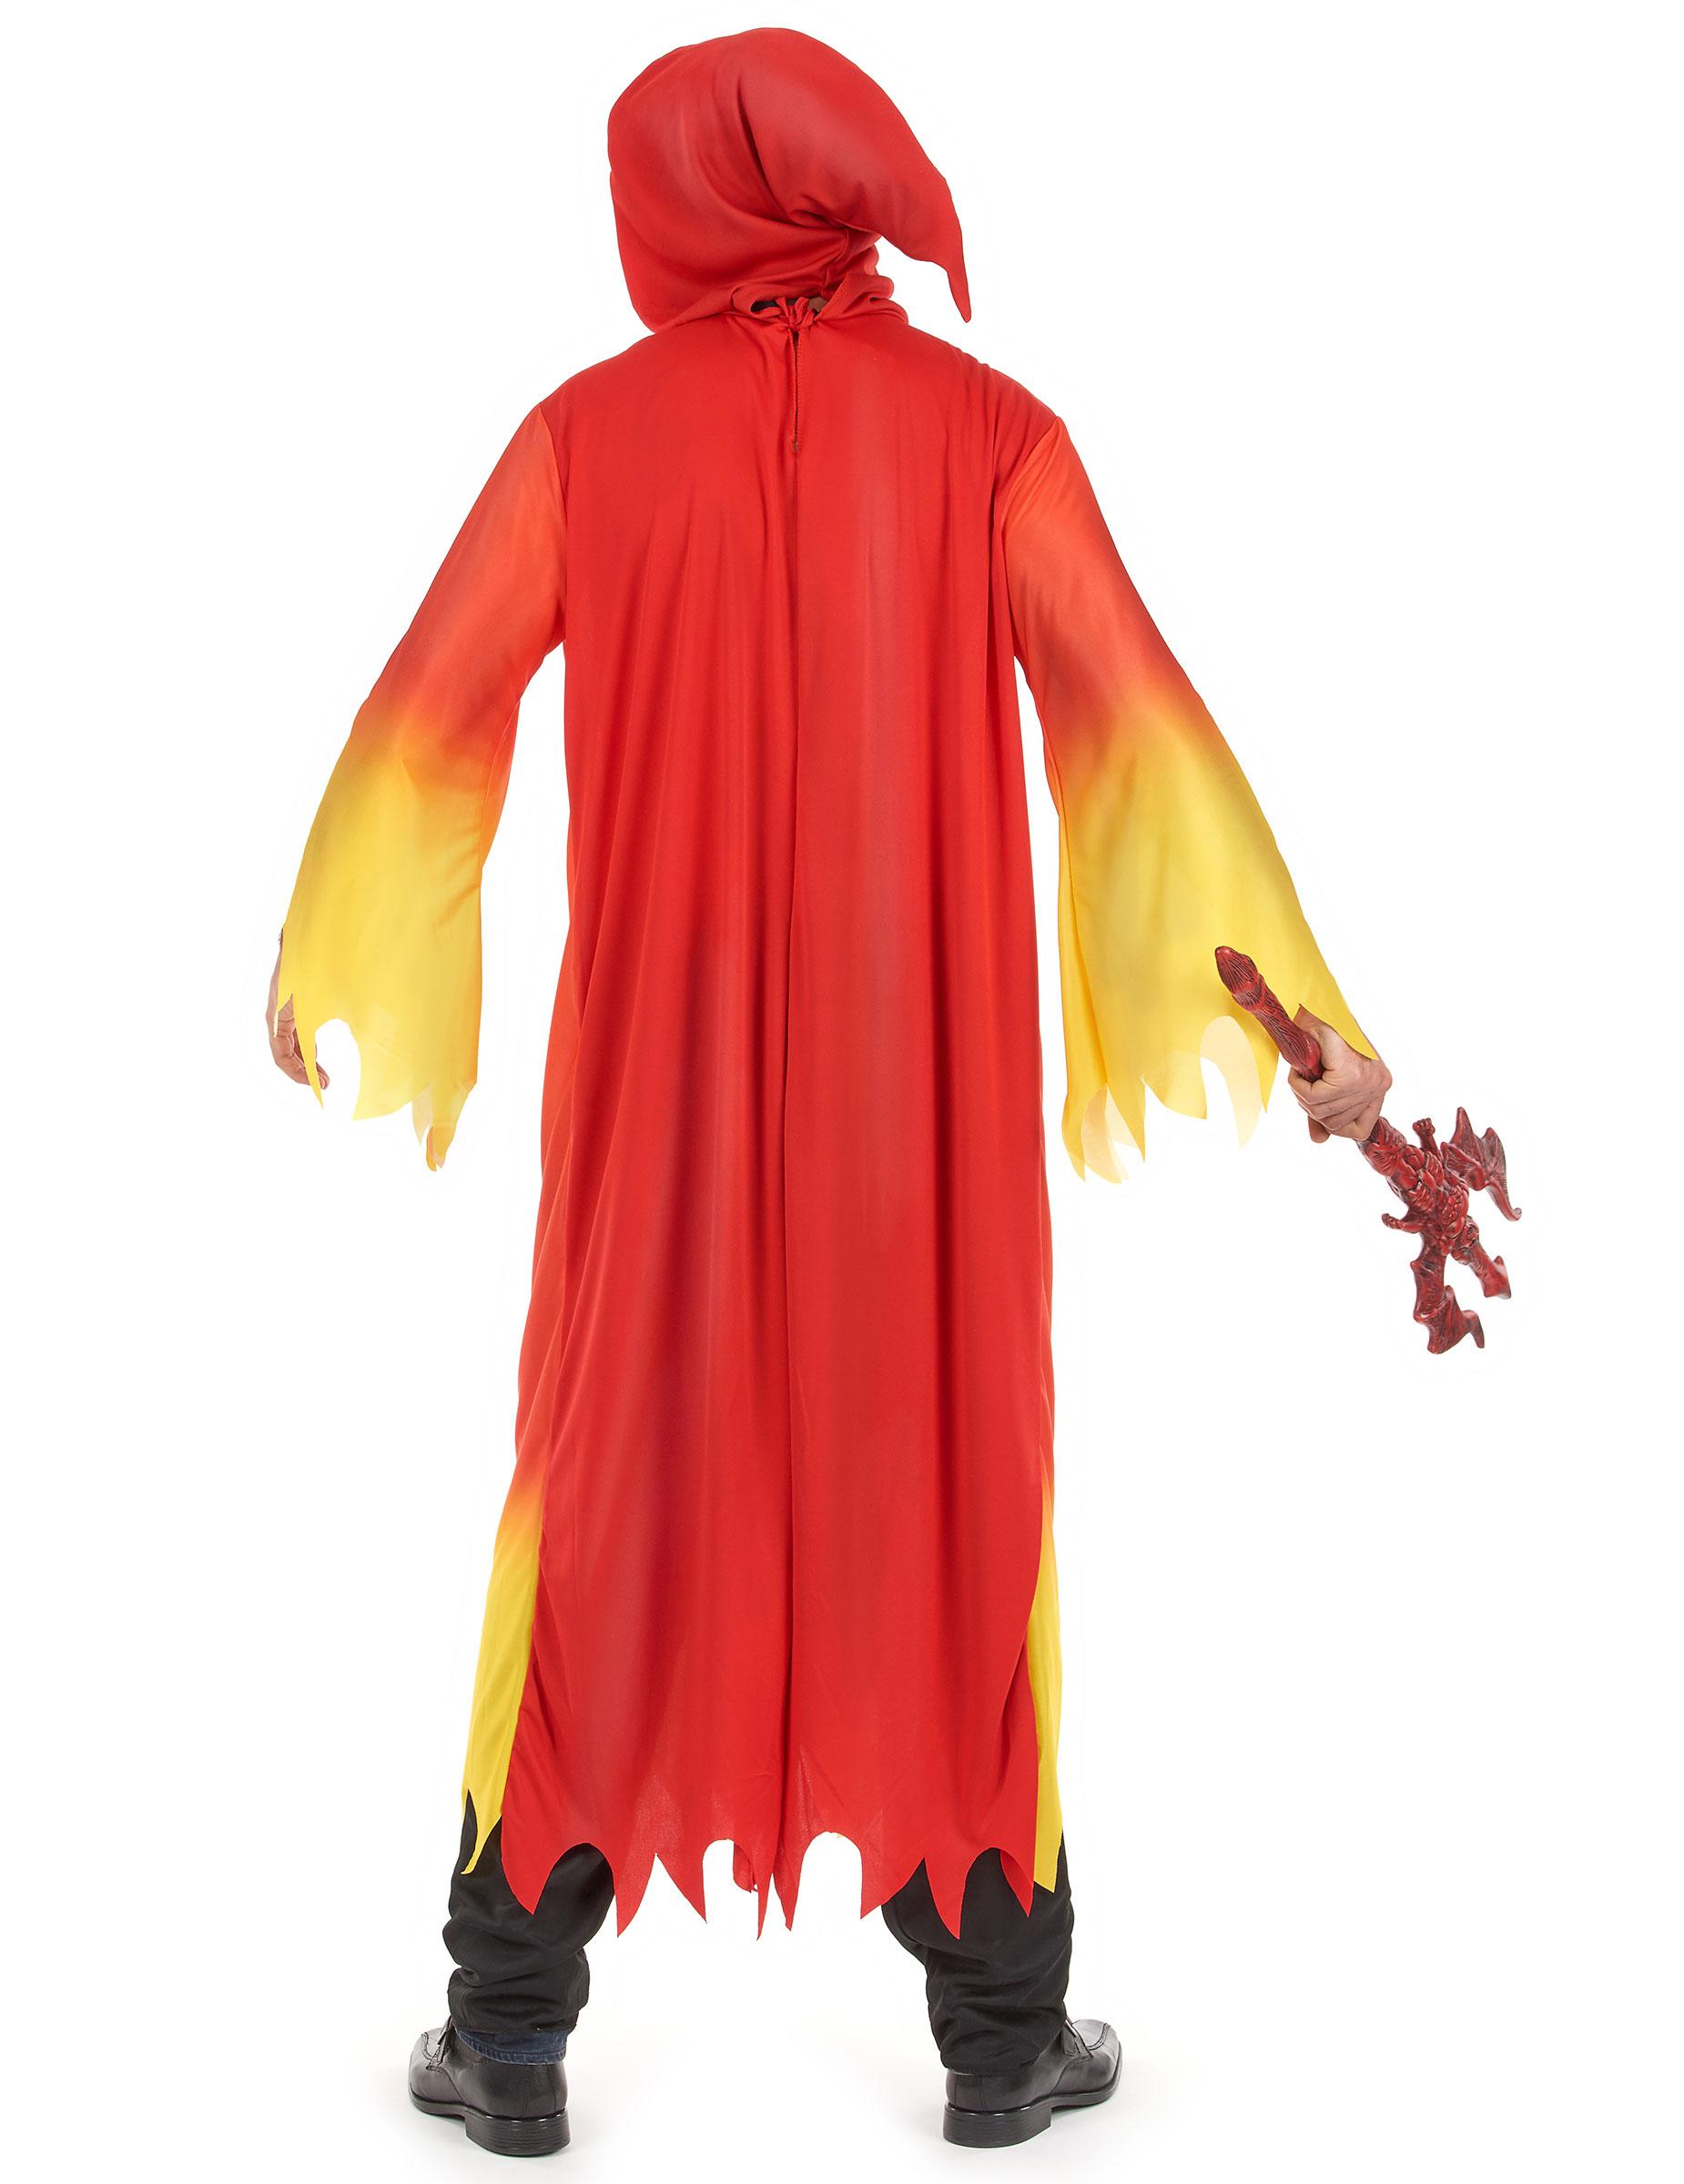 Déguisement diable flamboyant homme Halloween   Deguise-toi 571065ef949